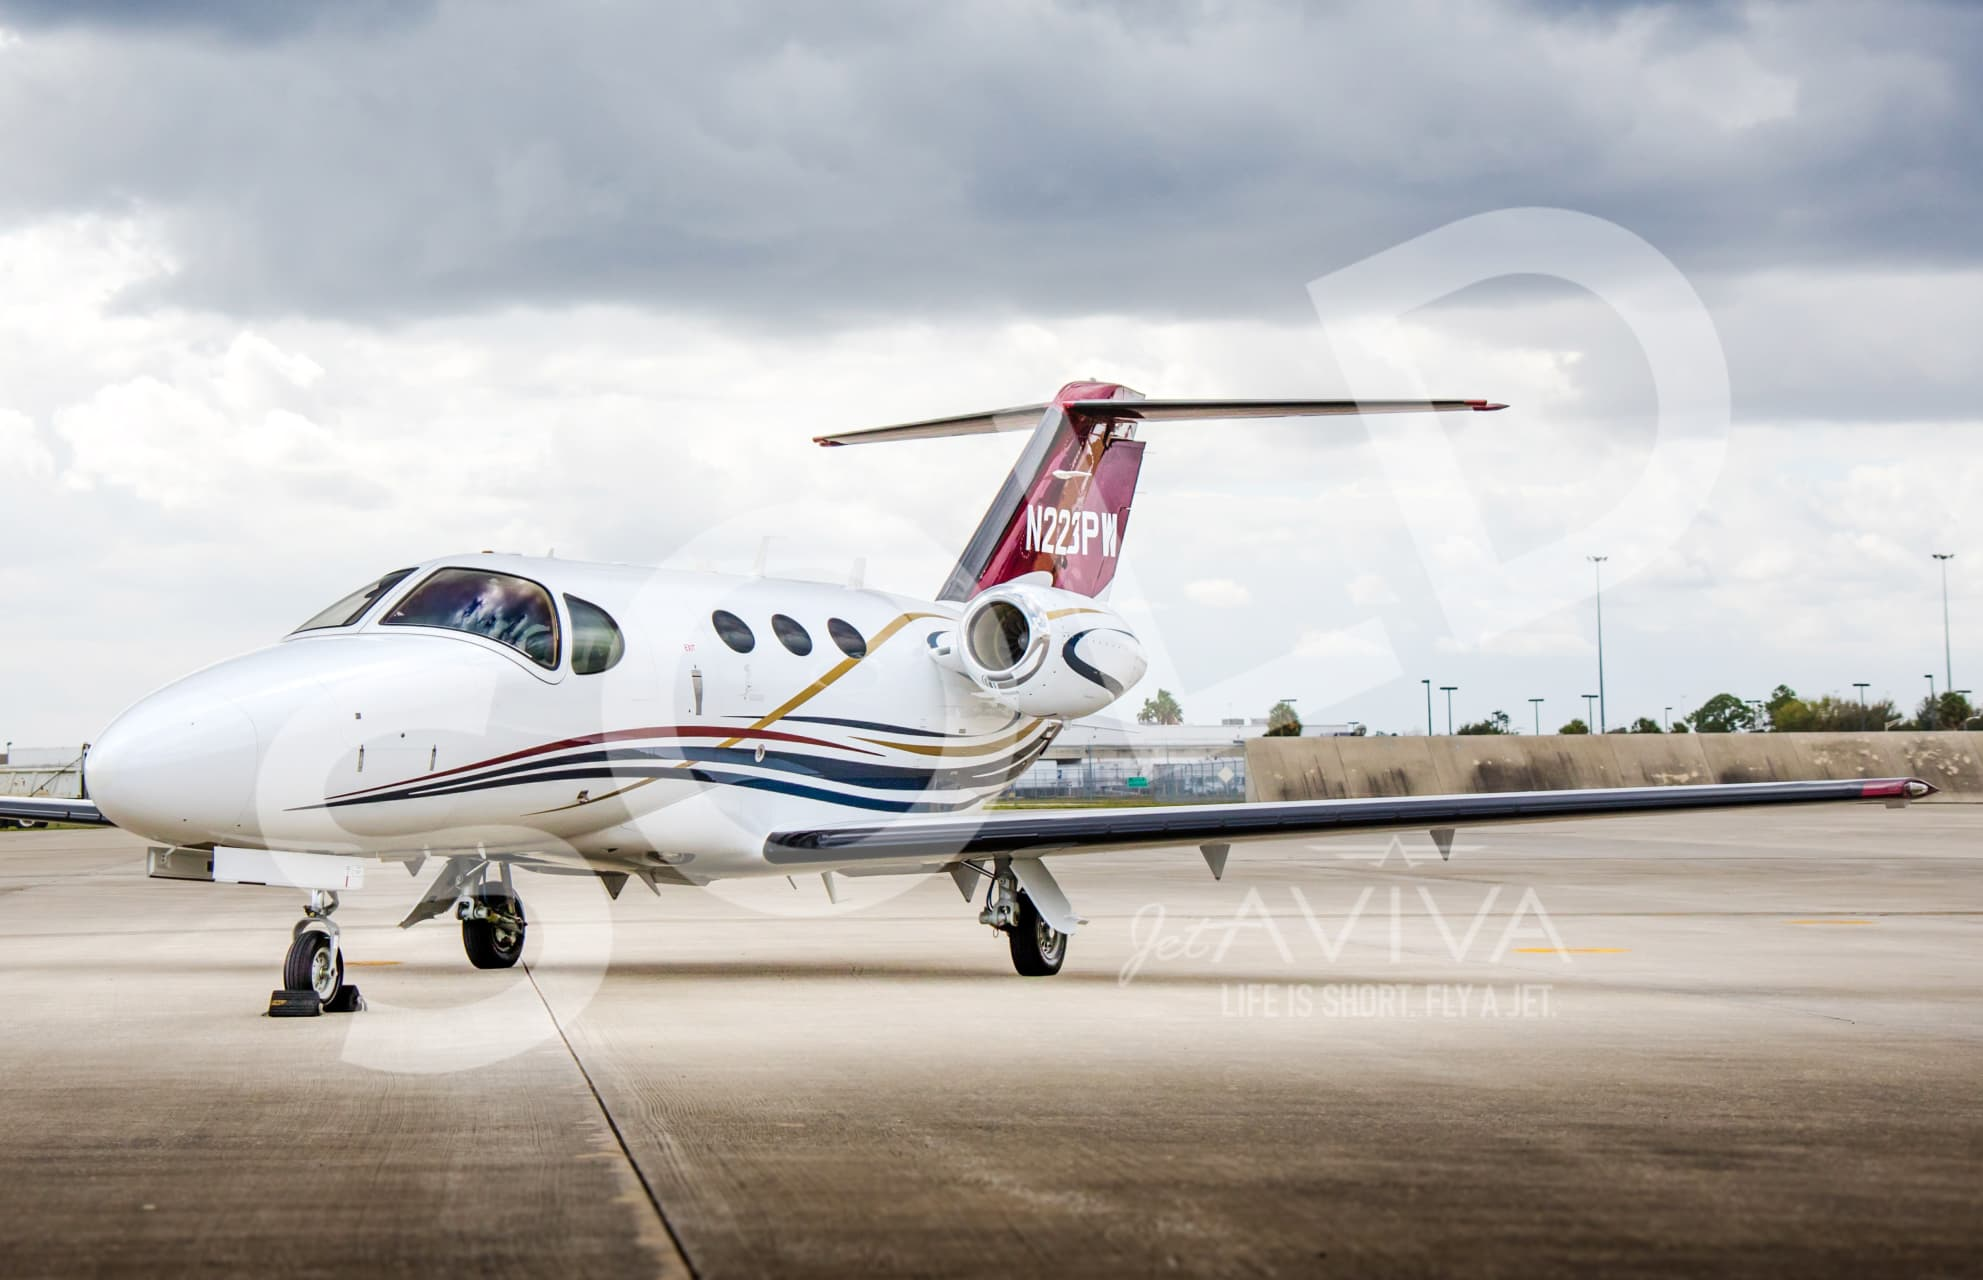 jetAVIVA - 2010 Cessna Citation 510 Mustang for sale